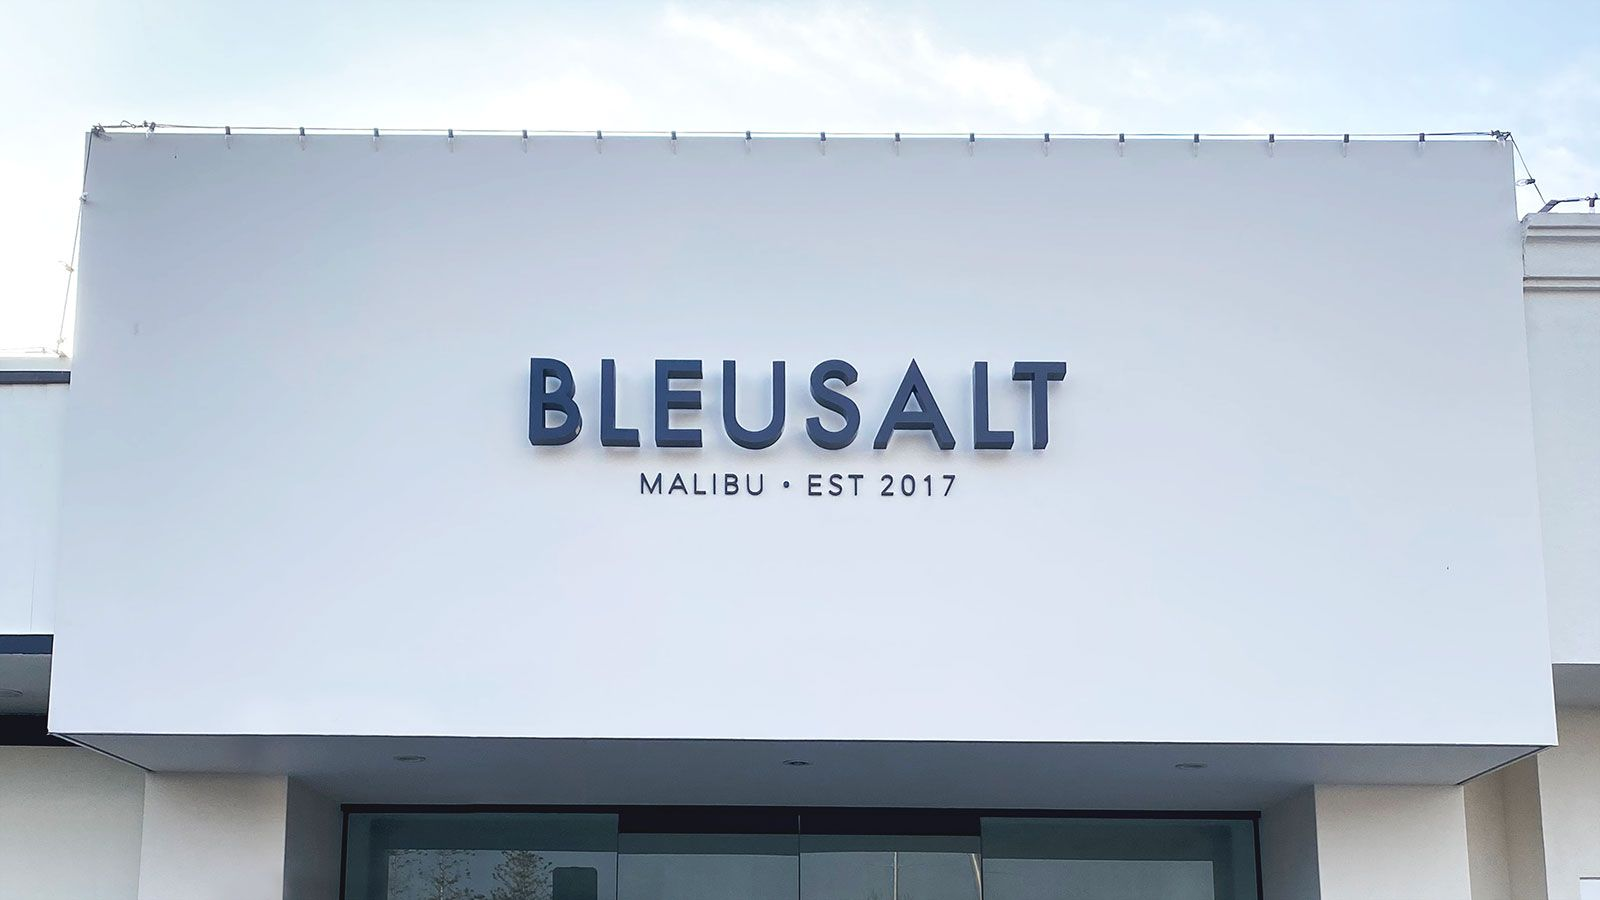 Bleusalt storefront 3d letters